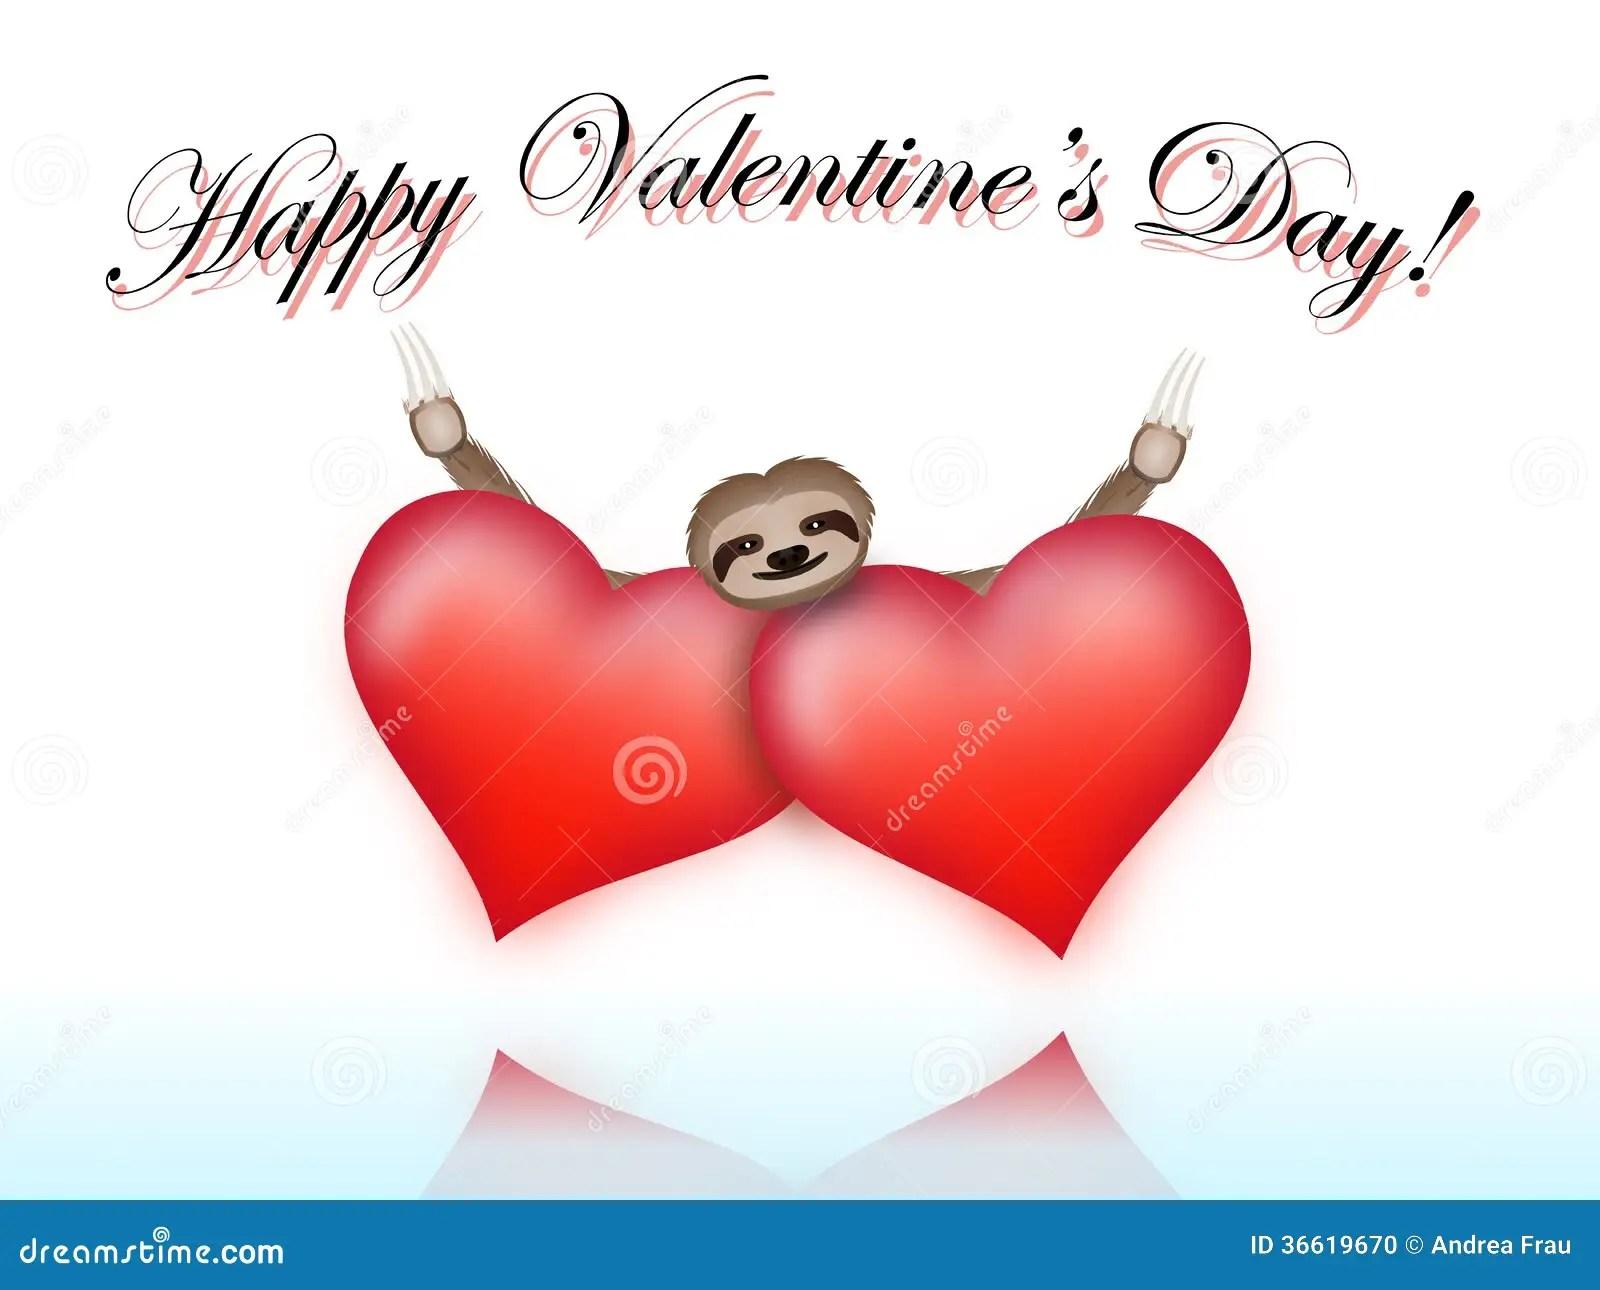 Sloth On Valentines Day Stock Photo Image 36619670